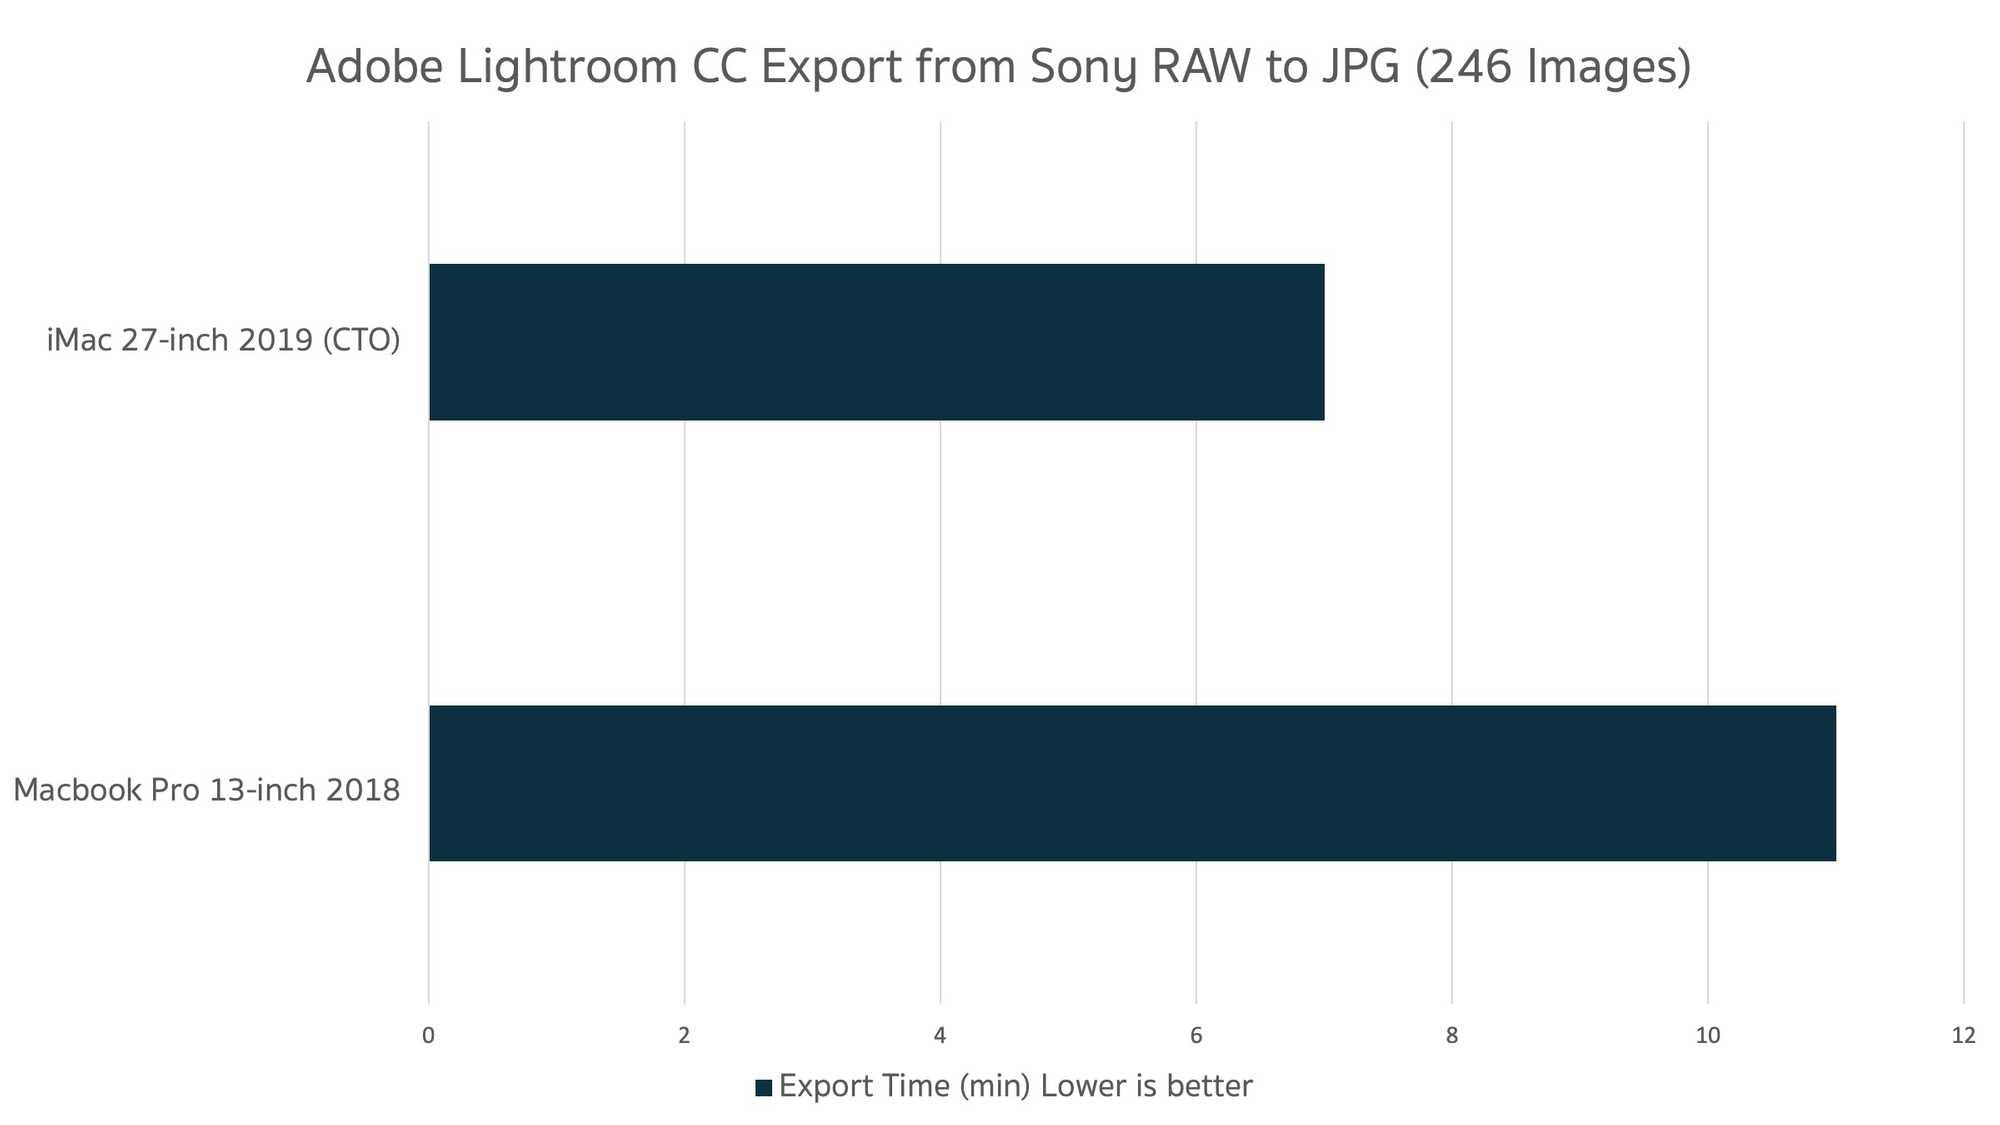 Compare Adobe Lightroom CC Export Time